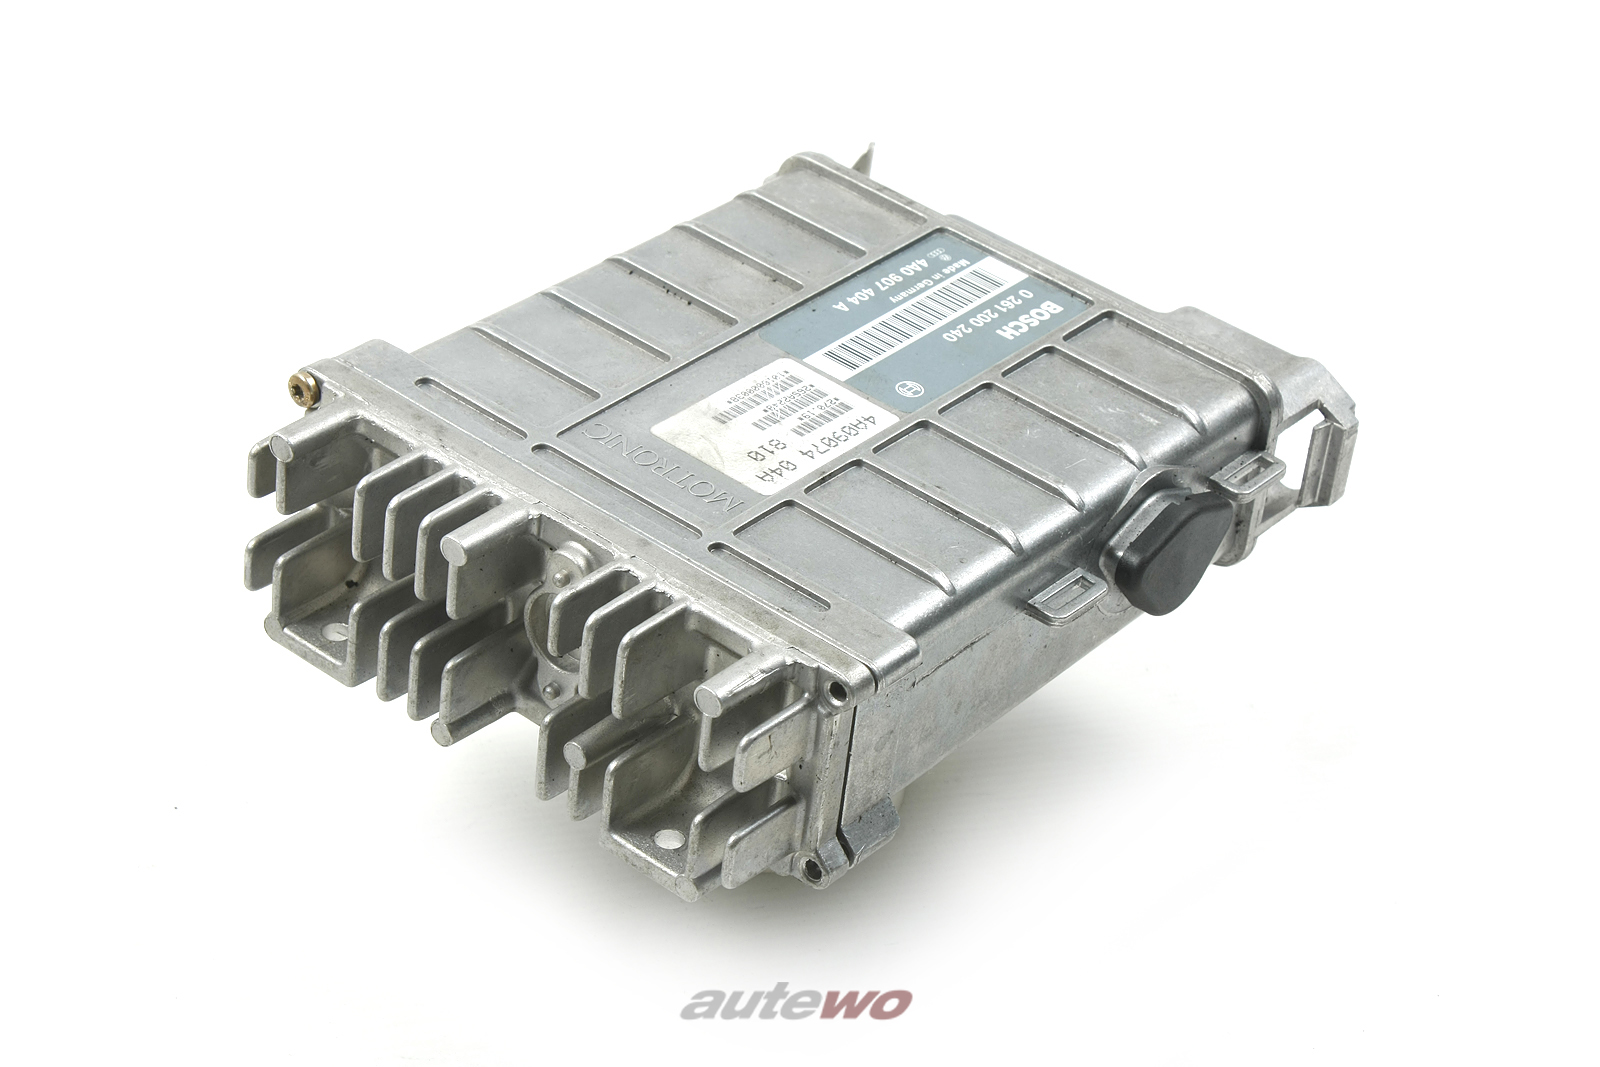 4A0997404 X 4A0907404A 0261200240 Audi 100 C4 2.0l Motorsteuergerät